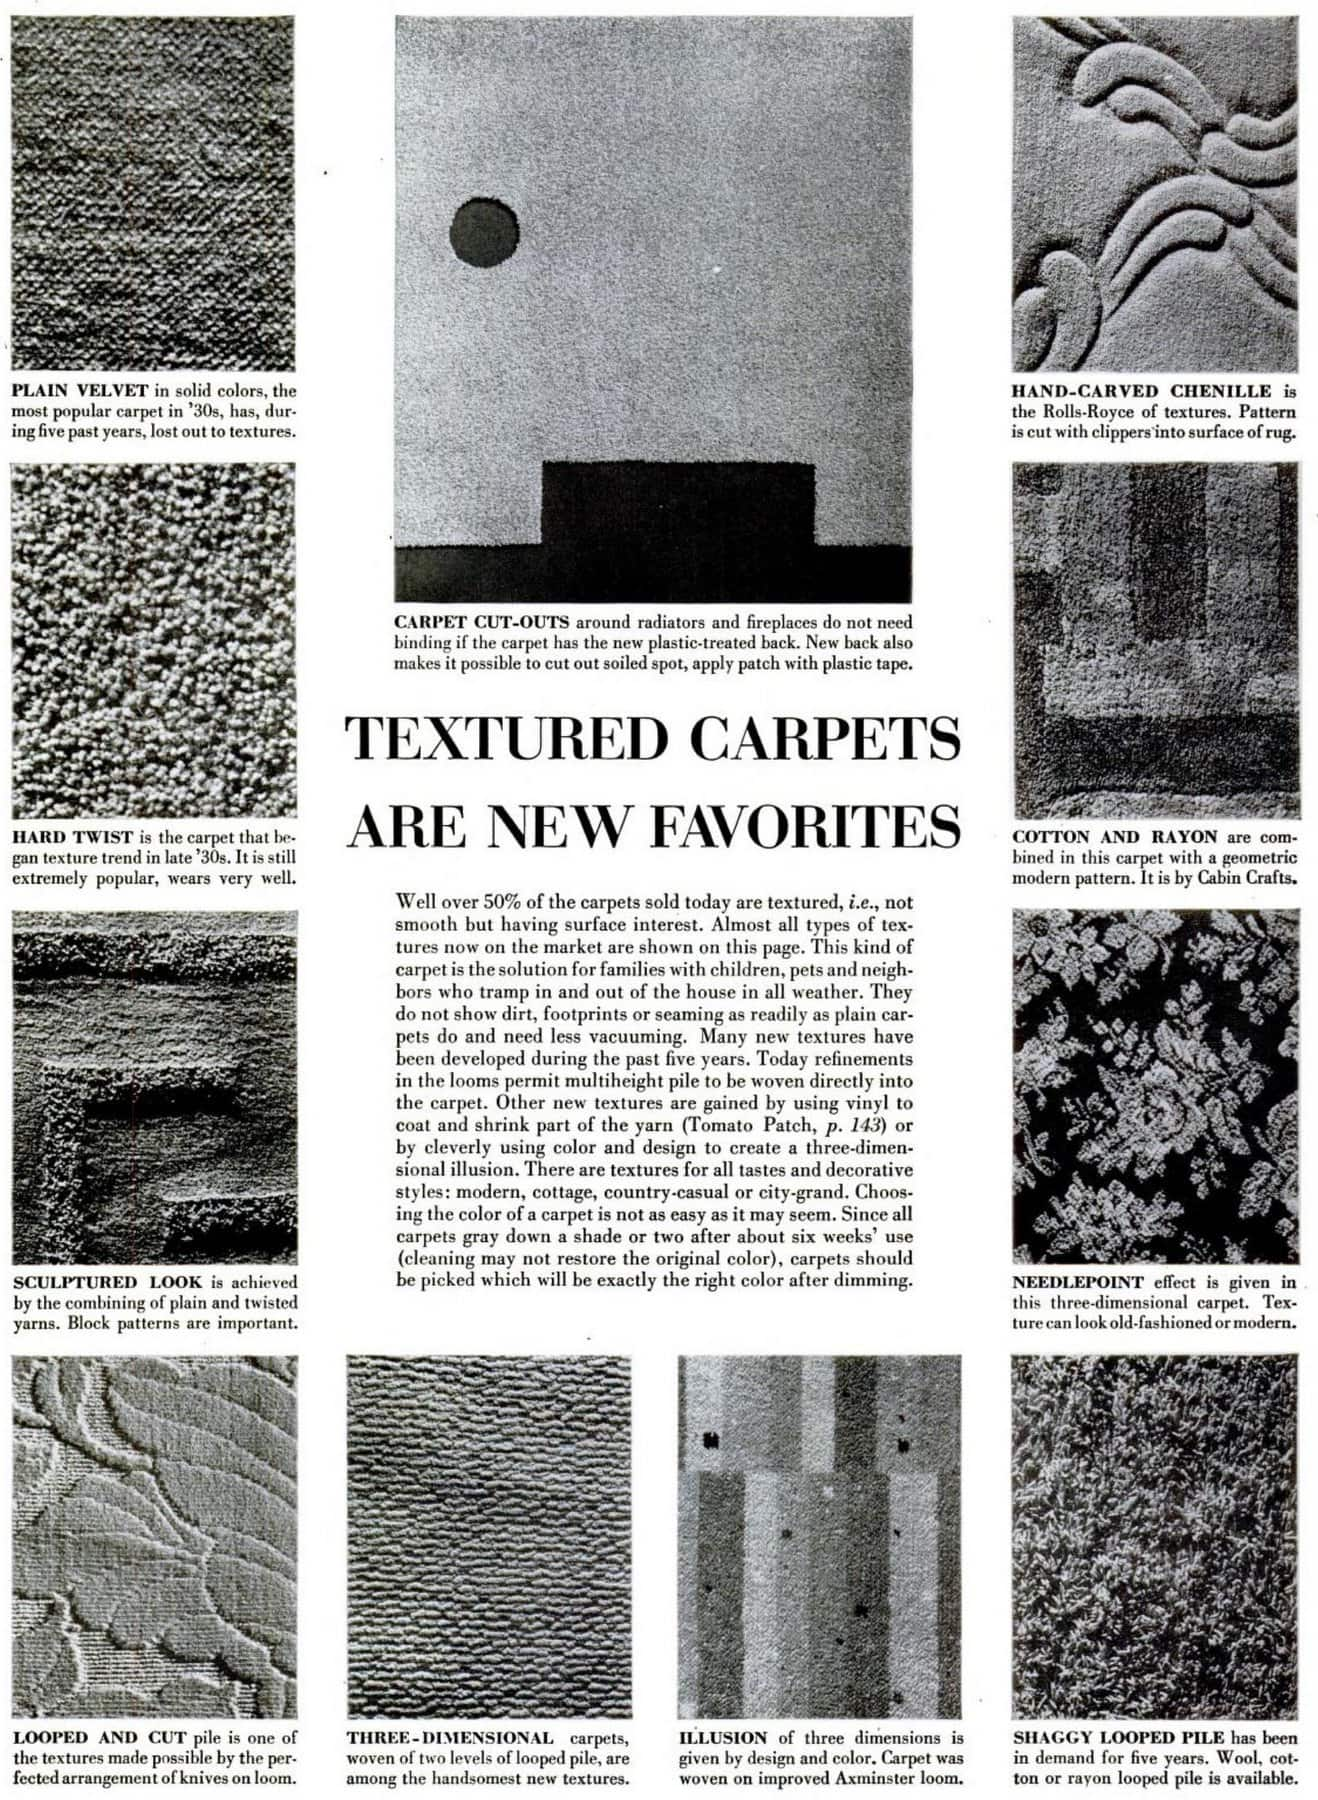 1951 Textured carpet styles